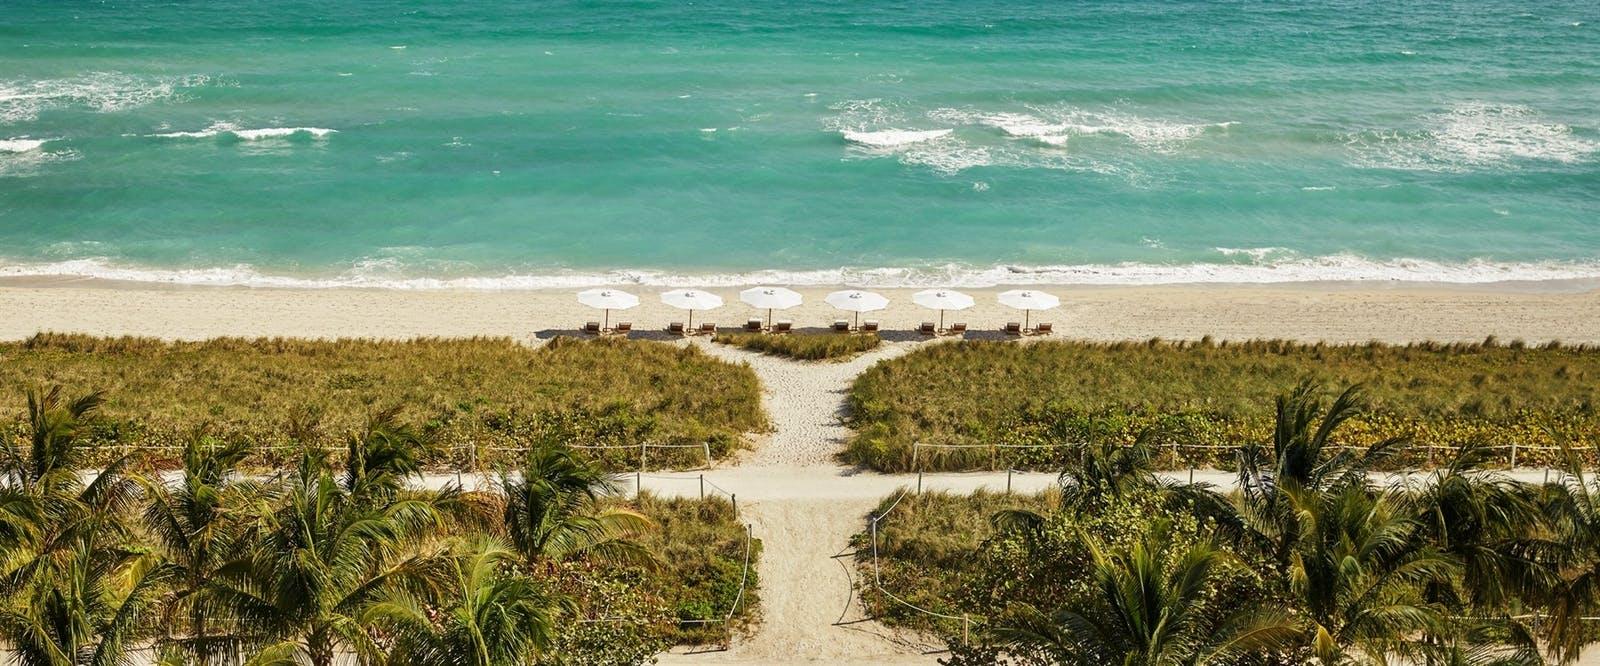 Four Seasons Hotel at The Surf Club, Miami & Florida's Coast